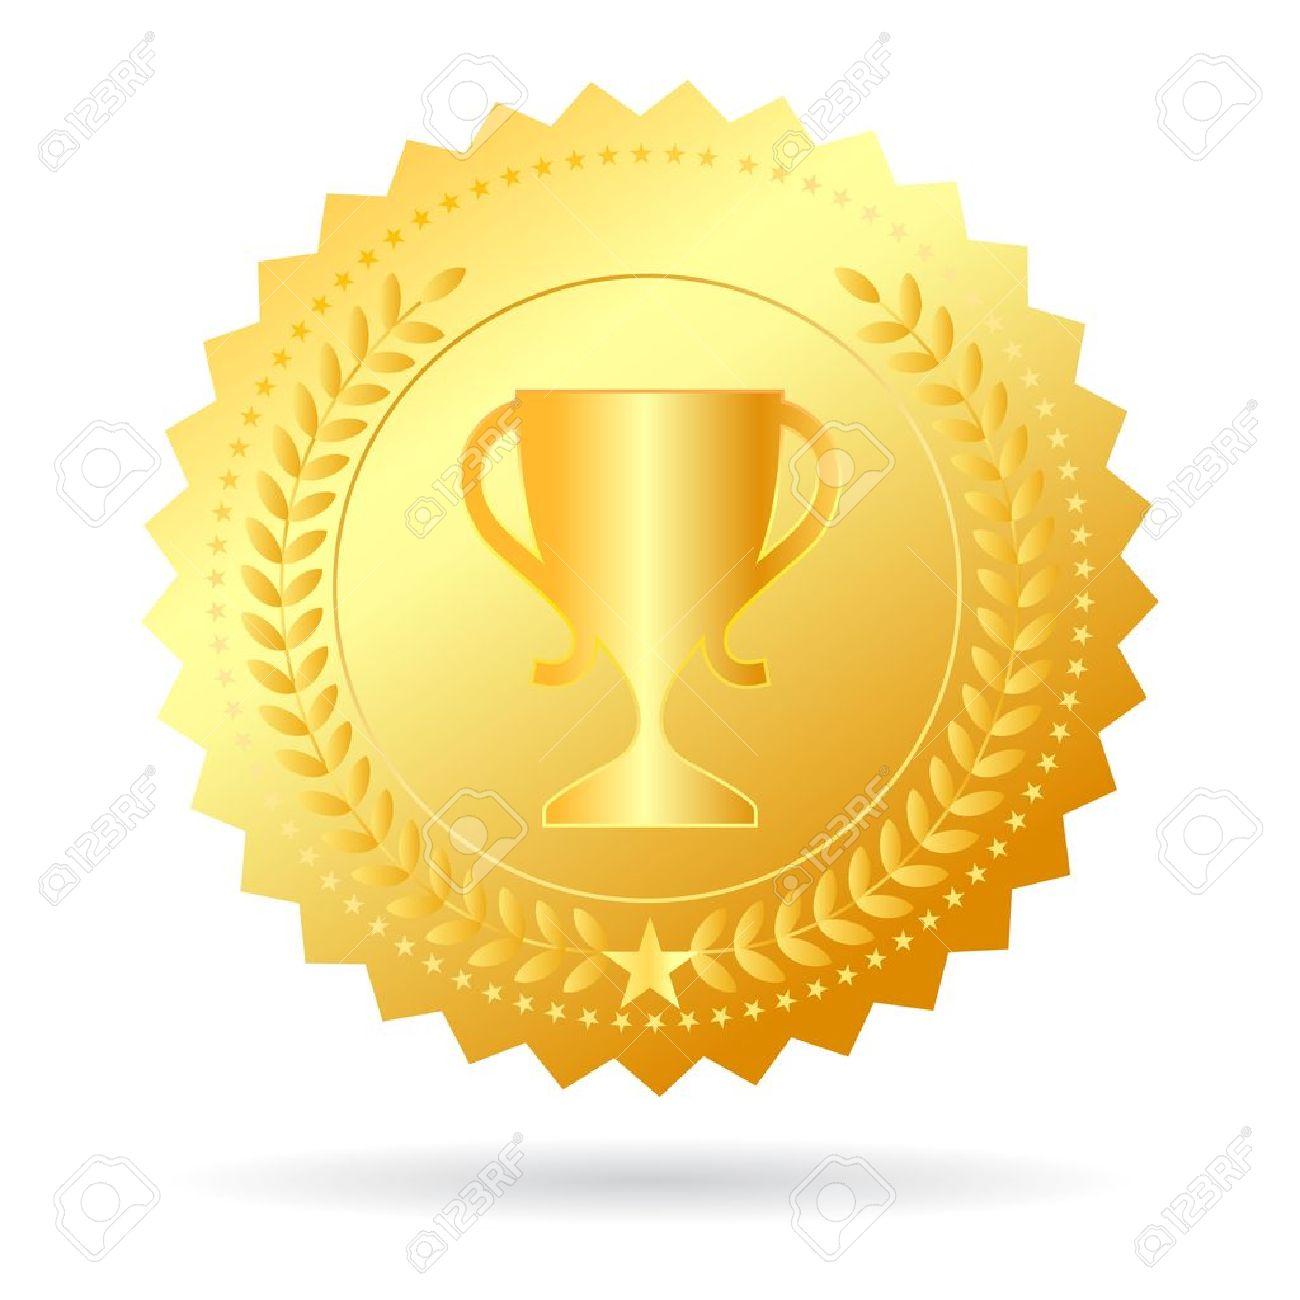 Champion gold medal illustration Stock Vector - 22071915